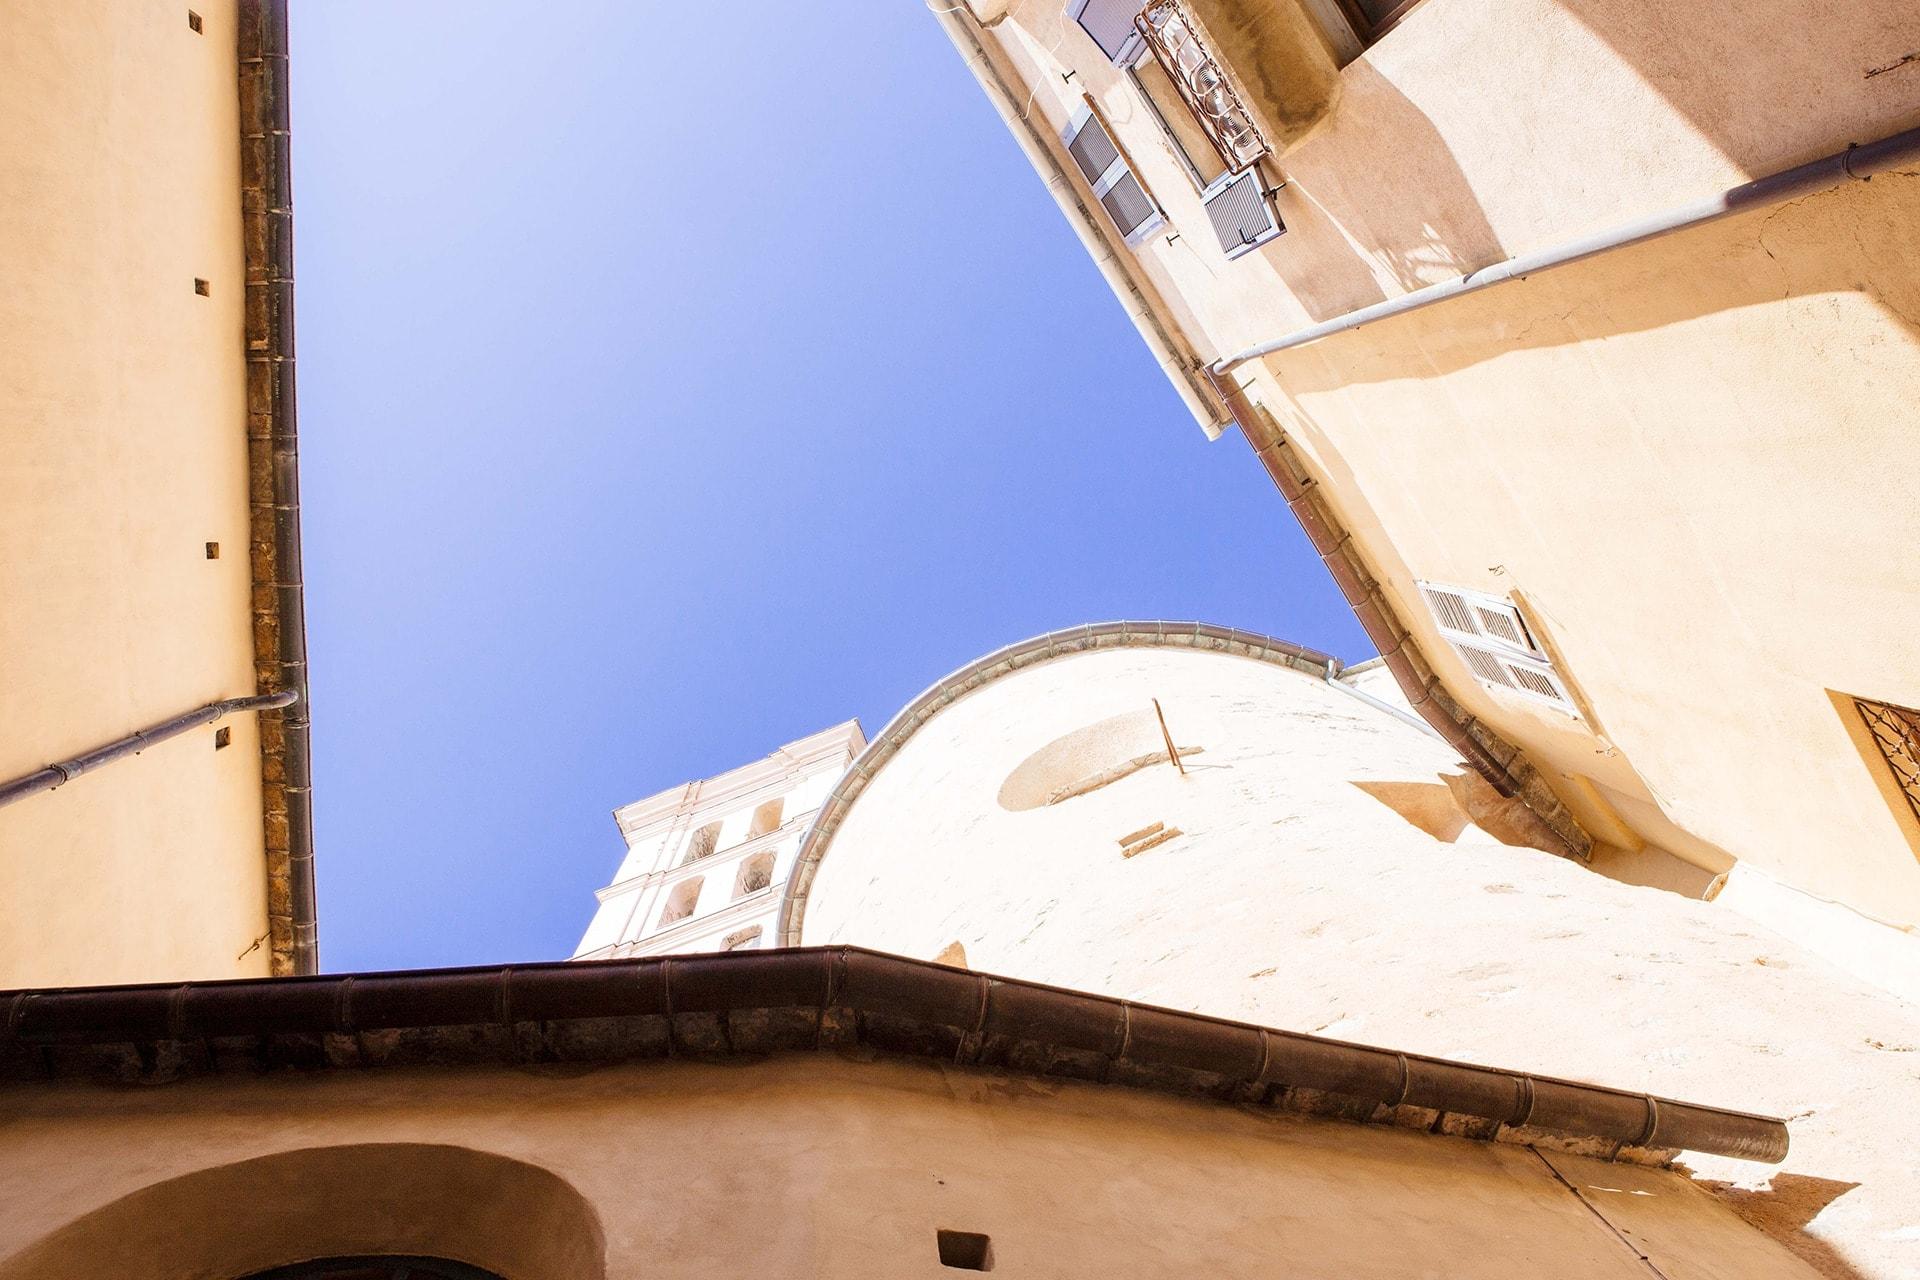 blog-voyage-sabine-kley-corse-balagne-bastia-ruelles